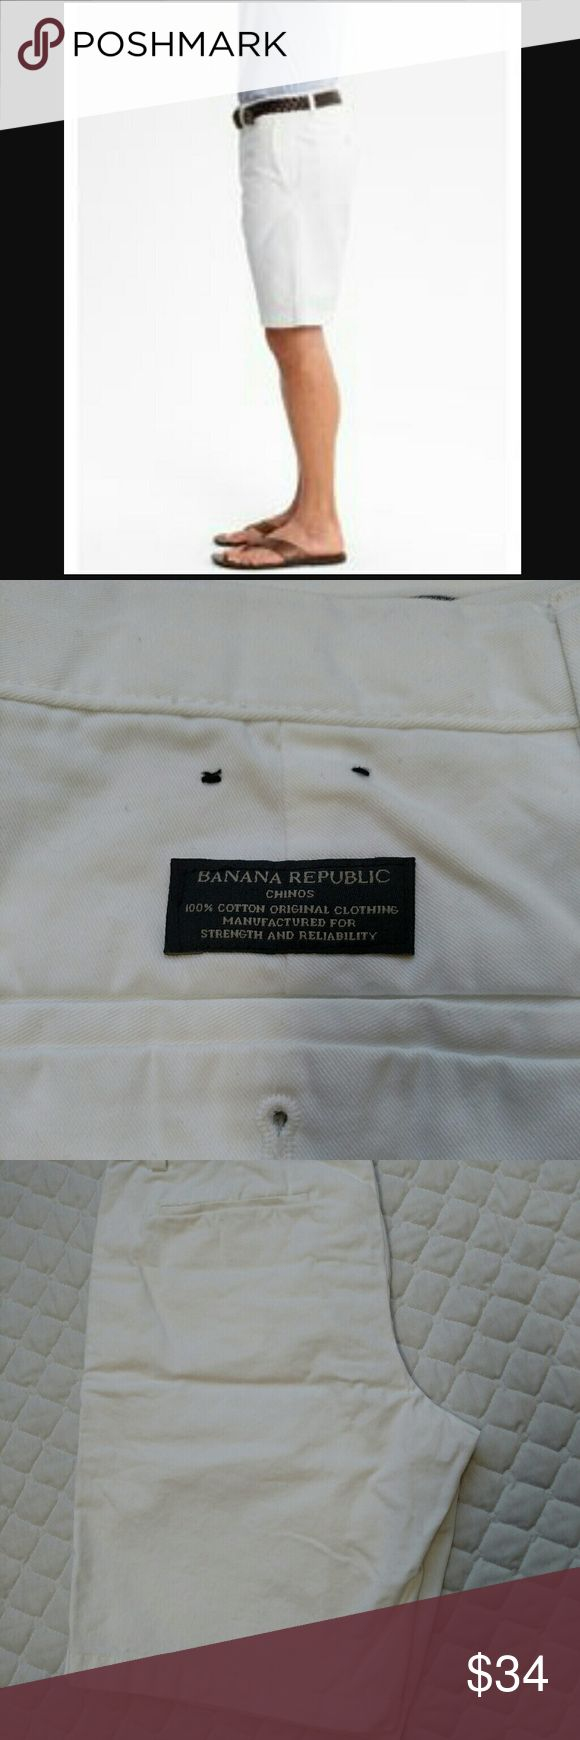 Banana Republic men's Chino white shorts 34 Unused men's Chino shorts.  Bright white (surprisingly hard to capture in a pic!). Banana Republic Shorts Flat Front